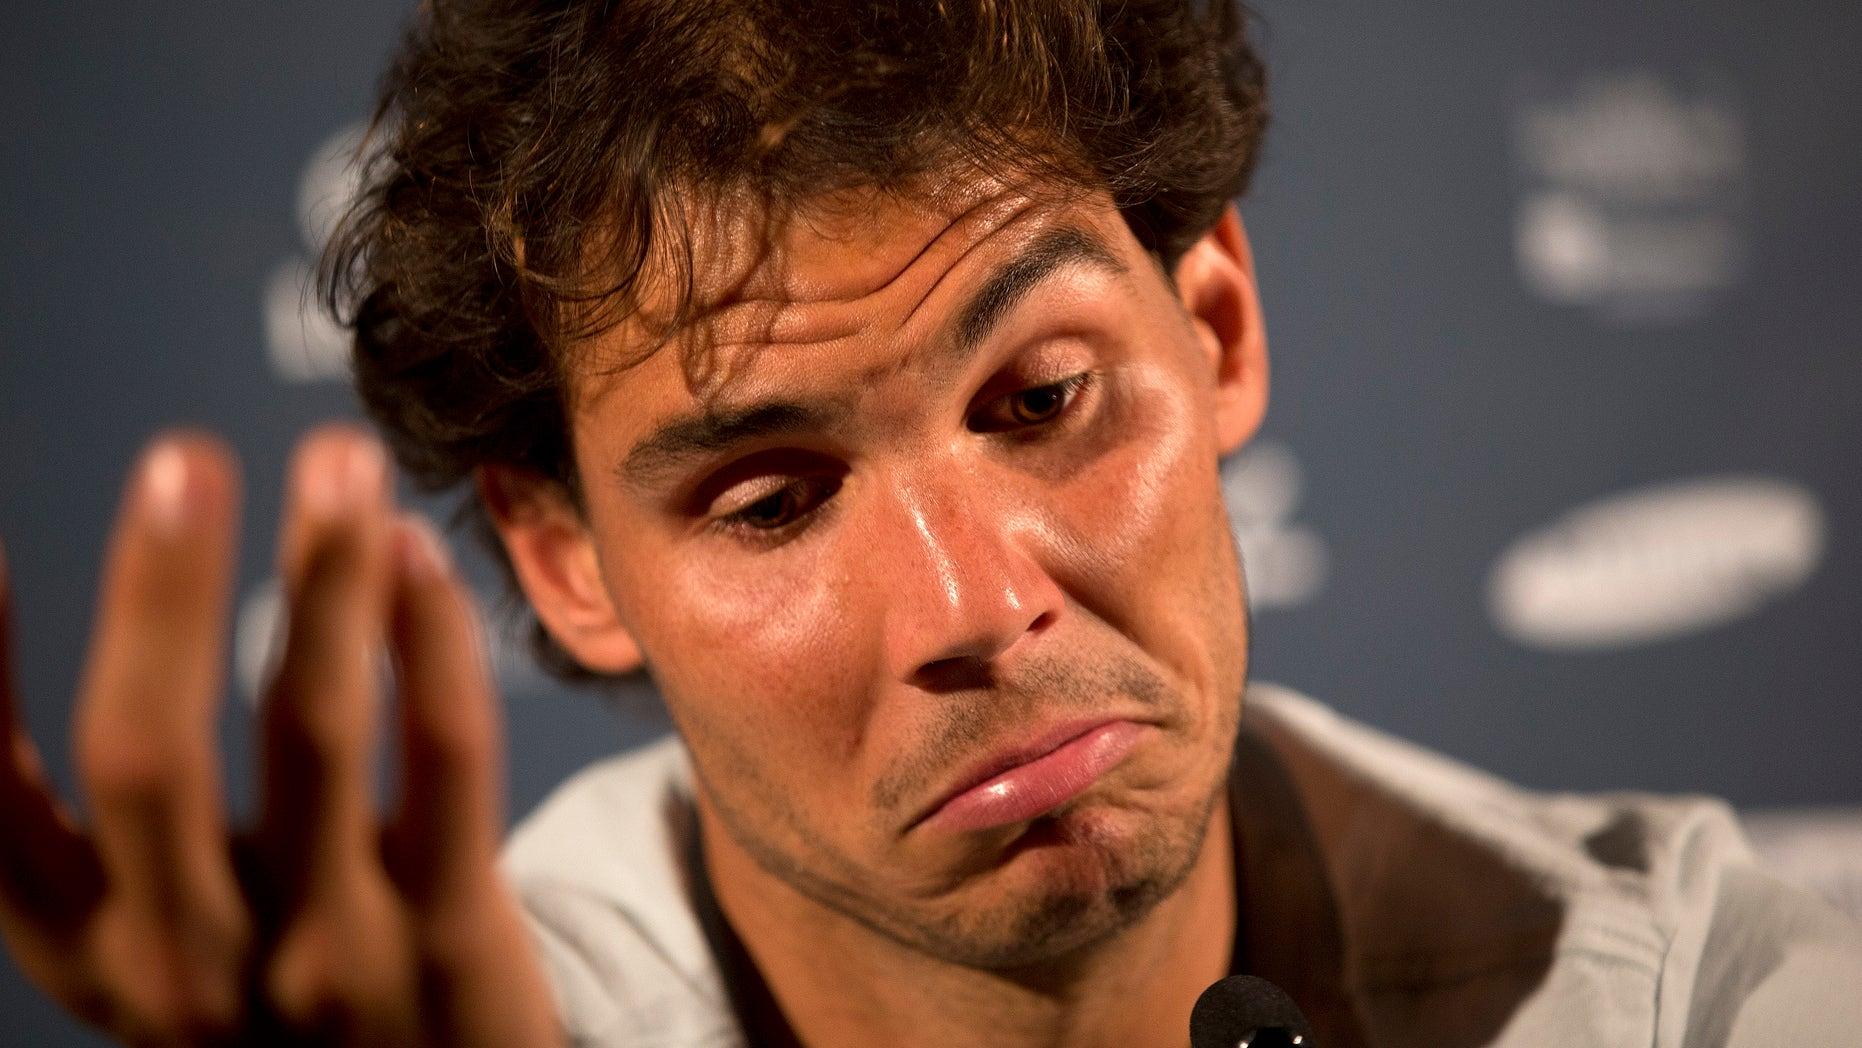 Rafael Nadal, of Spain, gestures during a press conference ahead of the Rio Open in Rio de Janeiro, Brazil, Friday, Feb. 13, 2015. The Rio Open tennis tournament starts Monday Feb. 16. (AP Photo/Silvia Izquierdo)